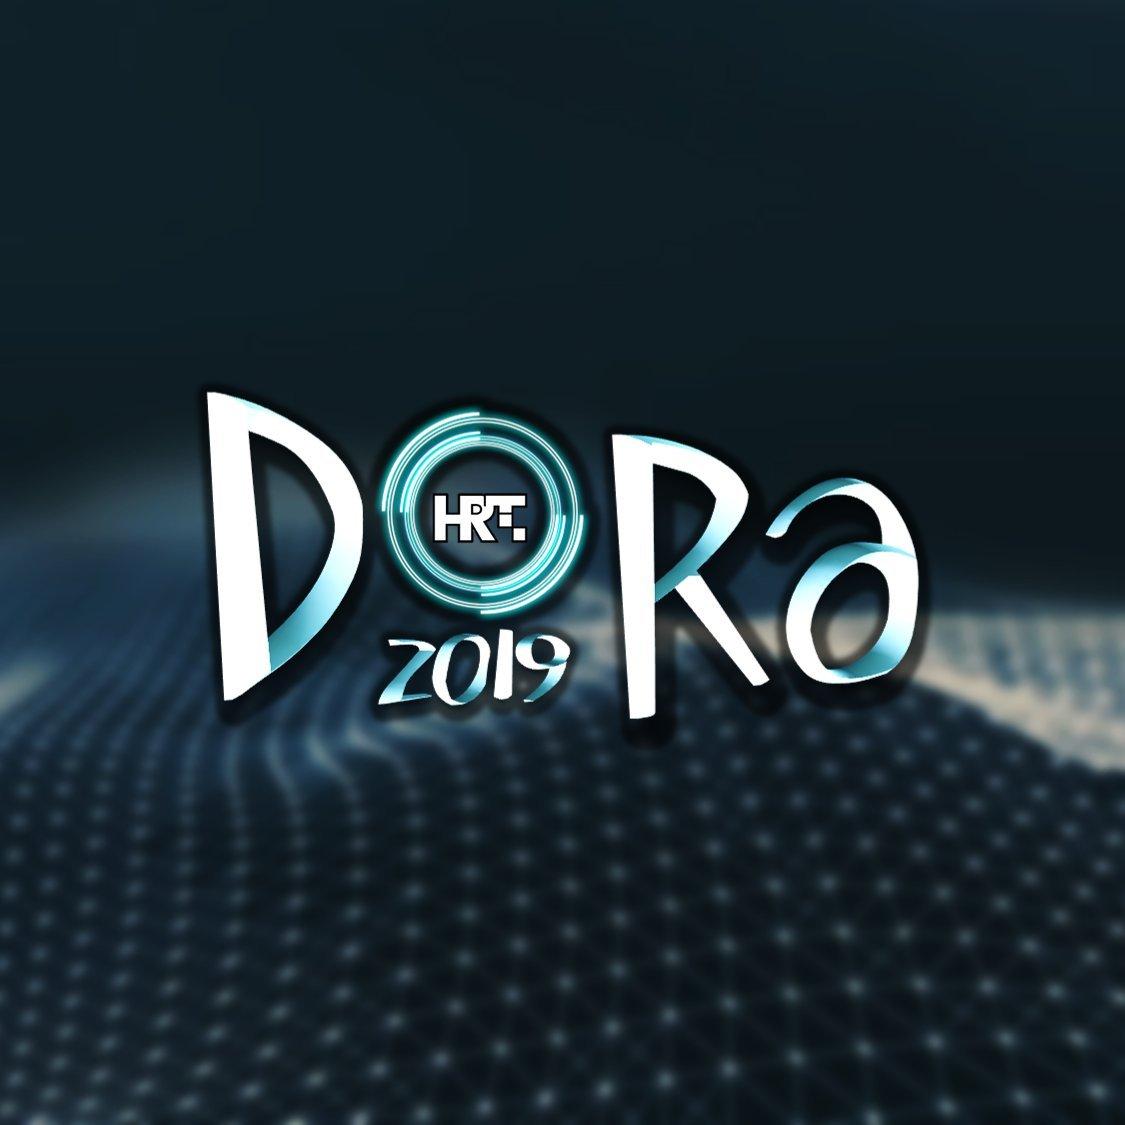 Dora 2019